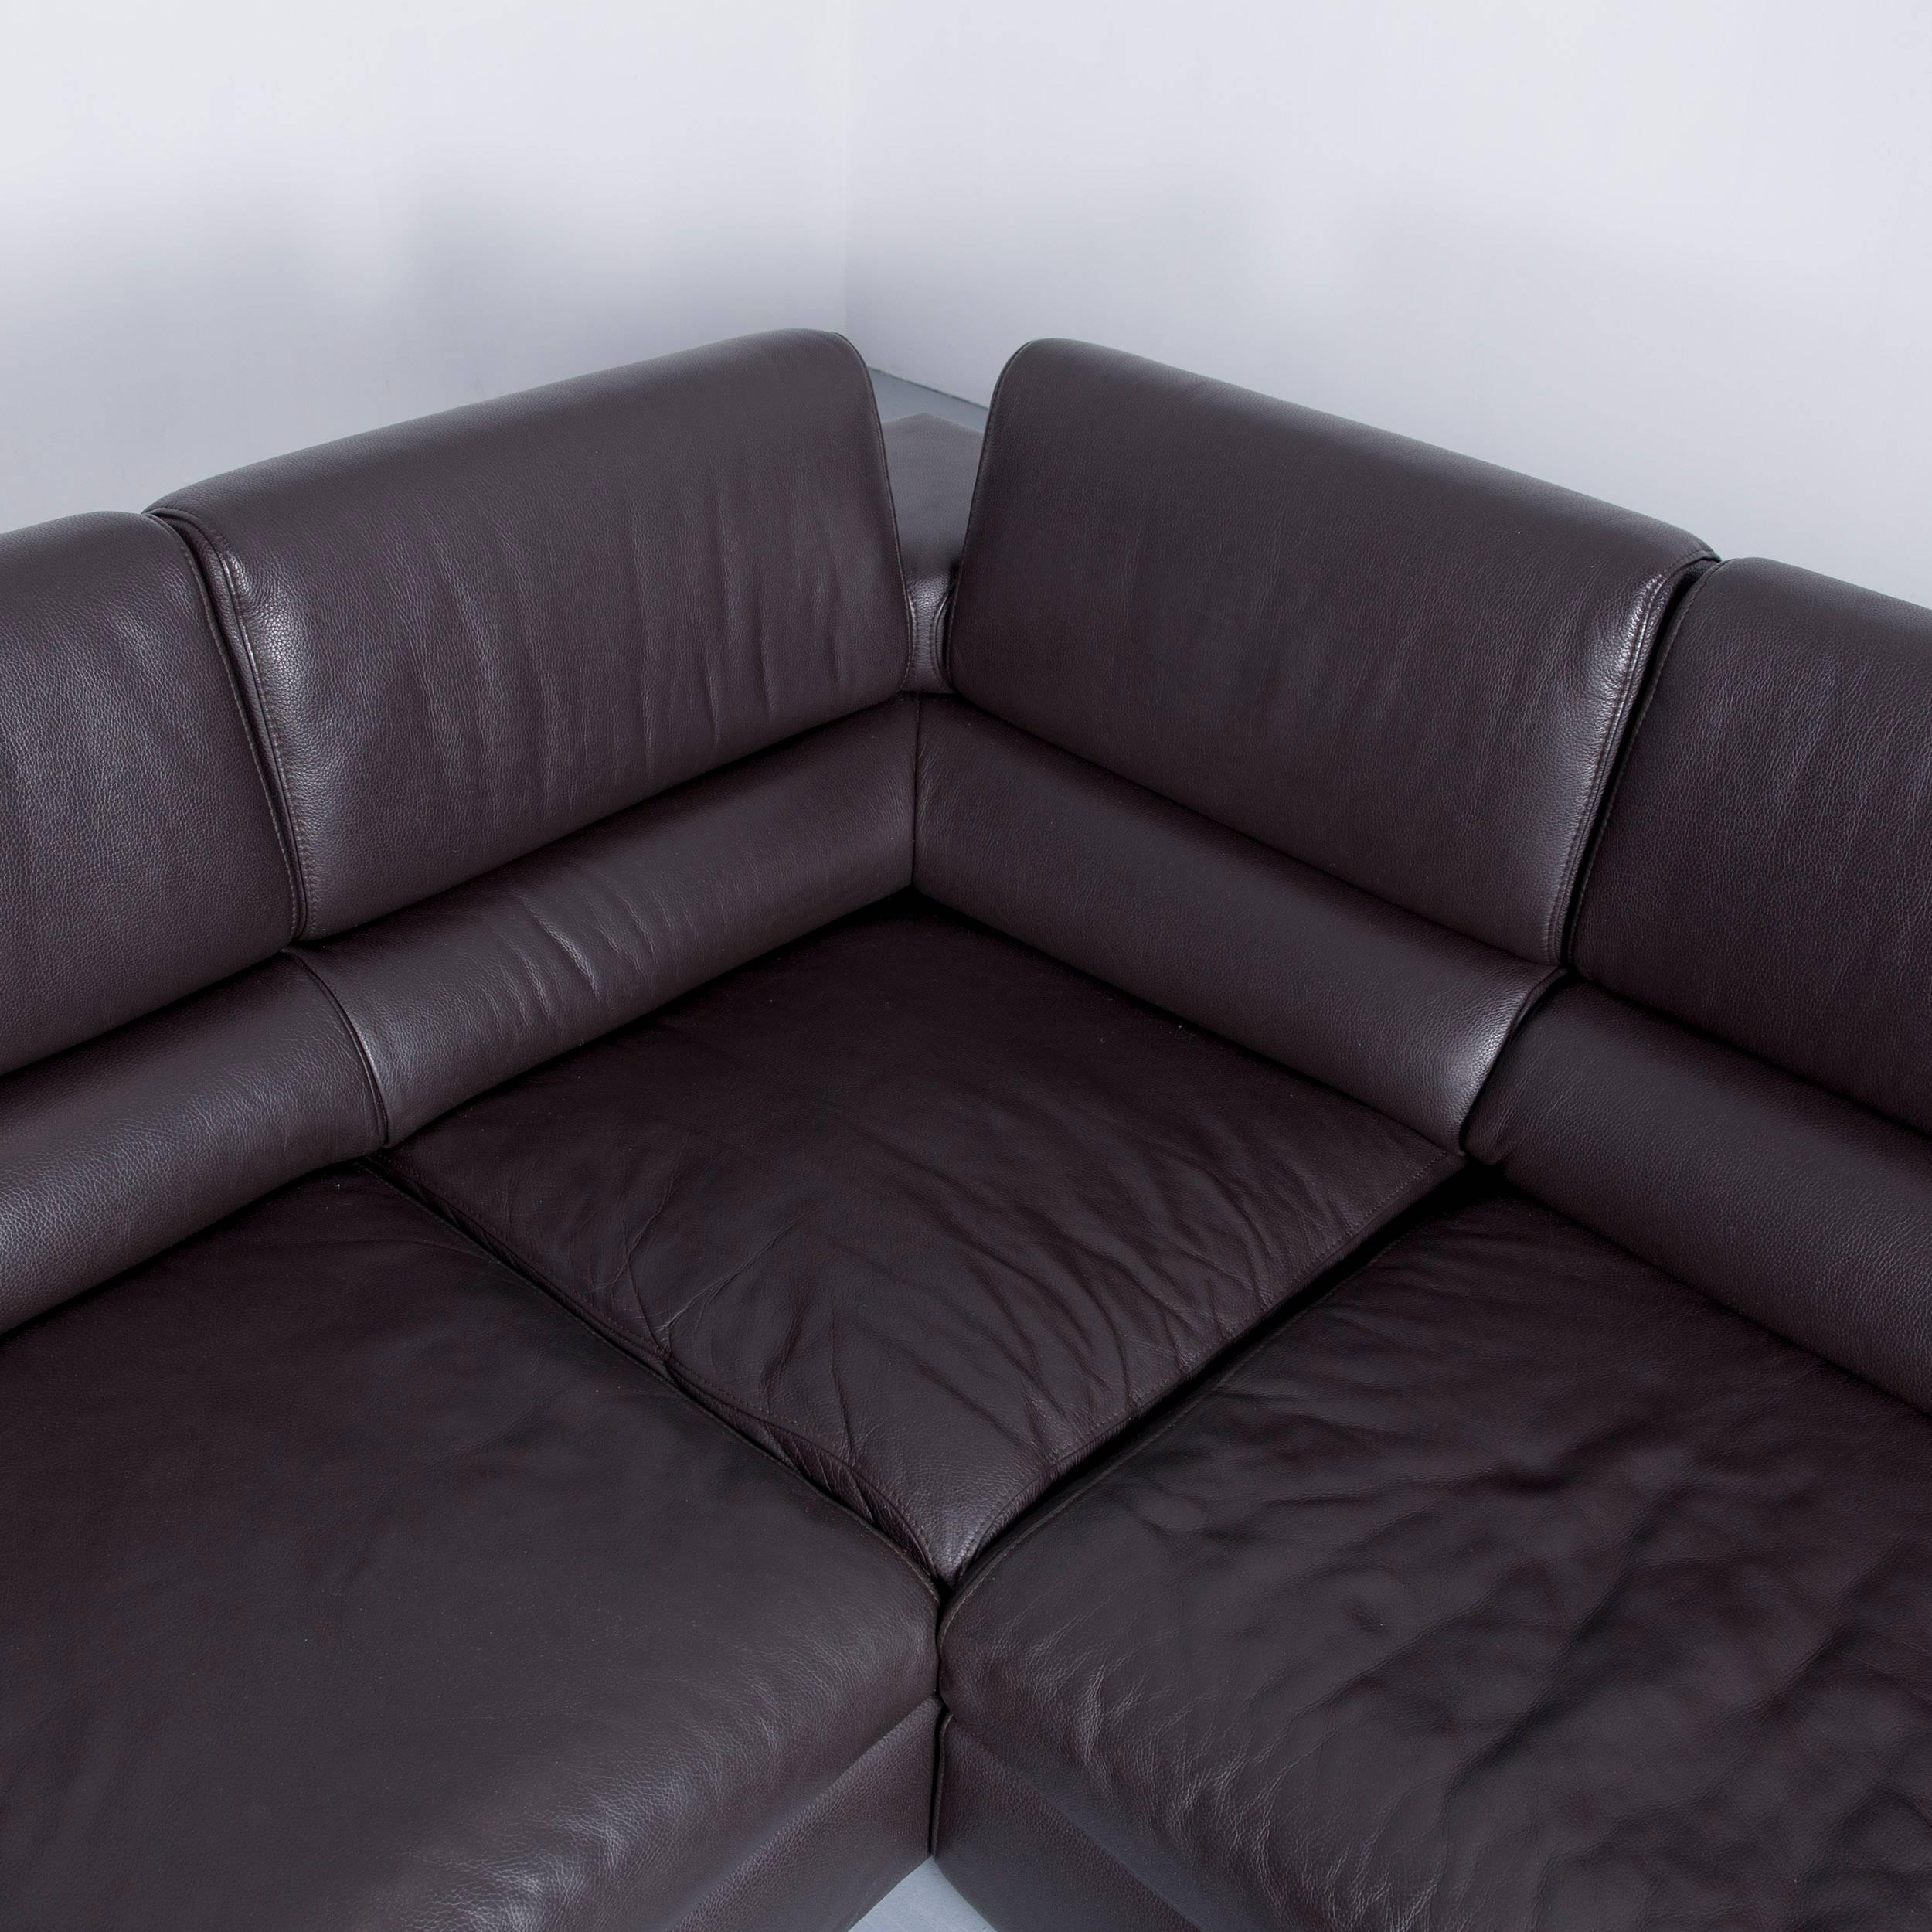 sofa eck excellent full size of moderne dekoration eck schlafsofa einer der grosen nachfrage im. Black Bedroom Furniture Sets. Home Design Ideas